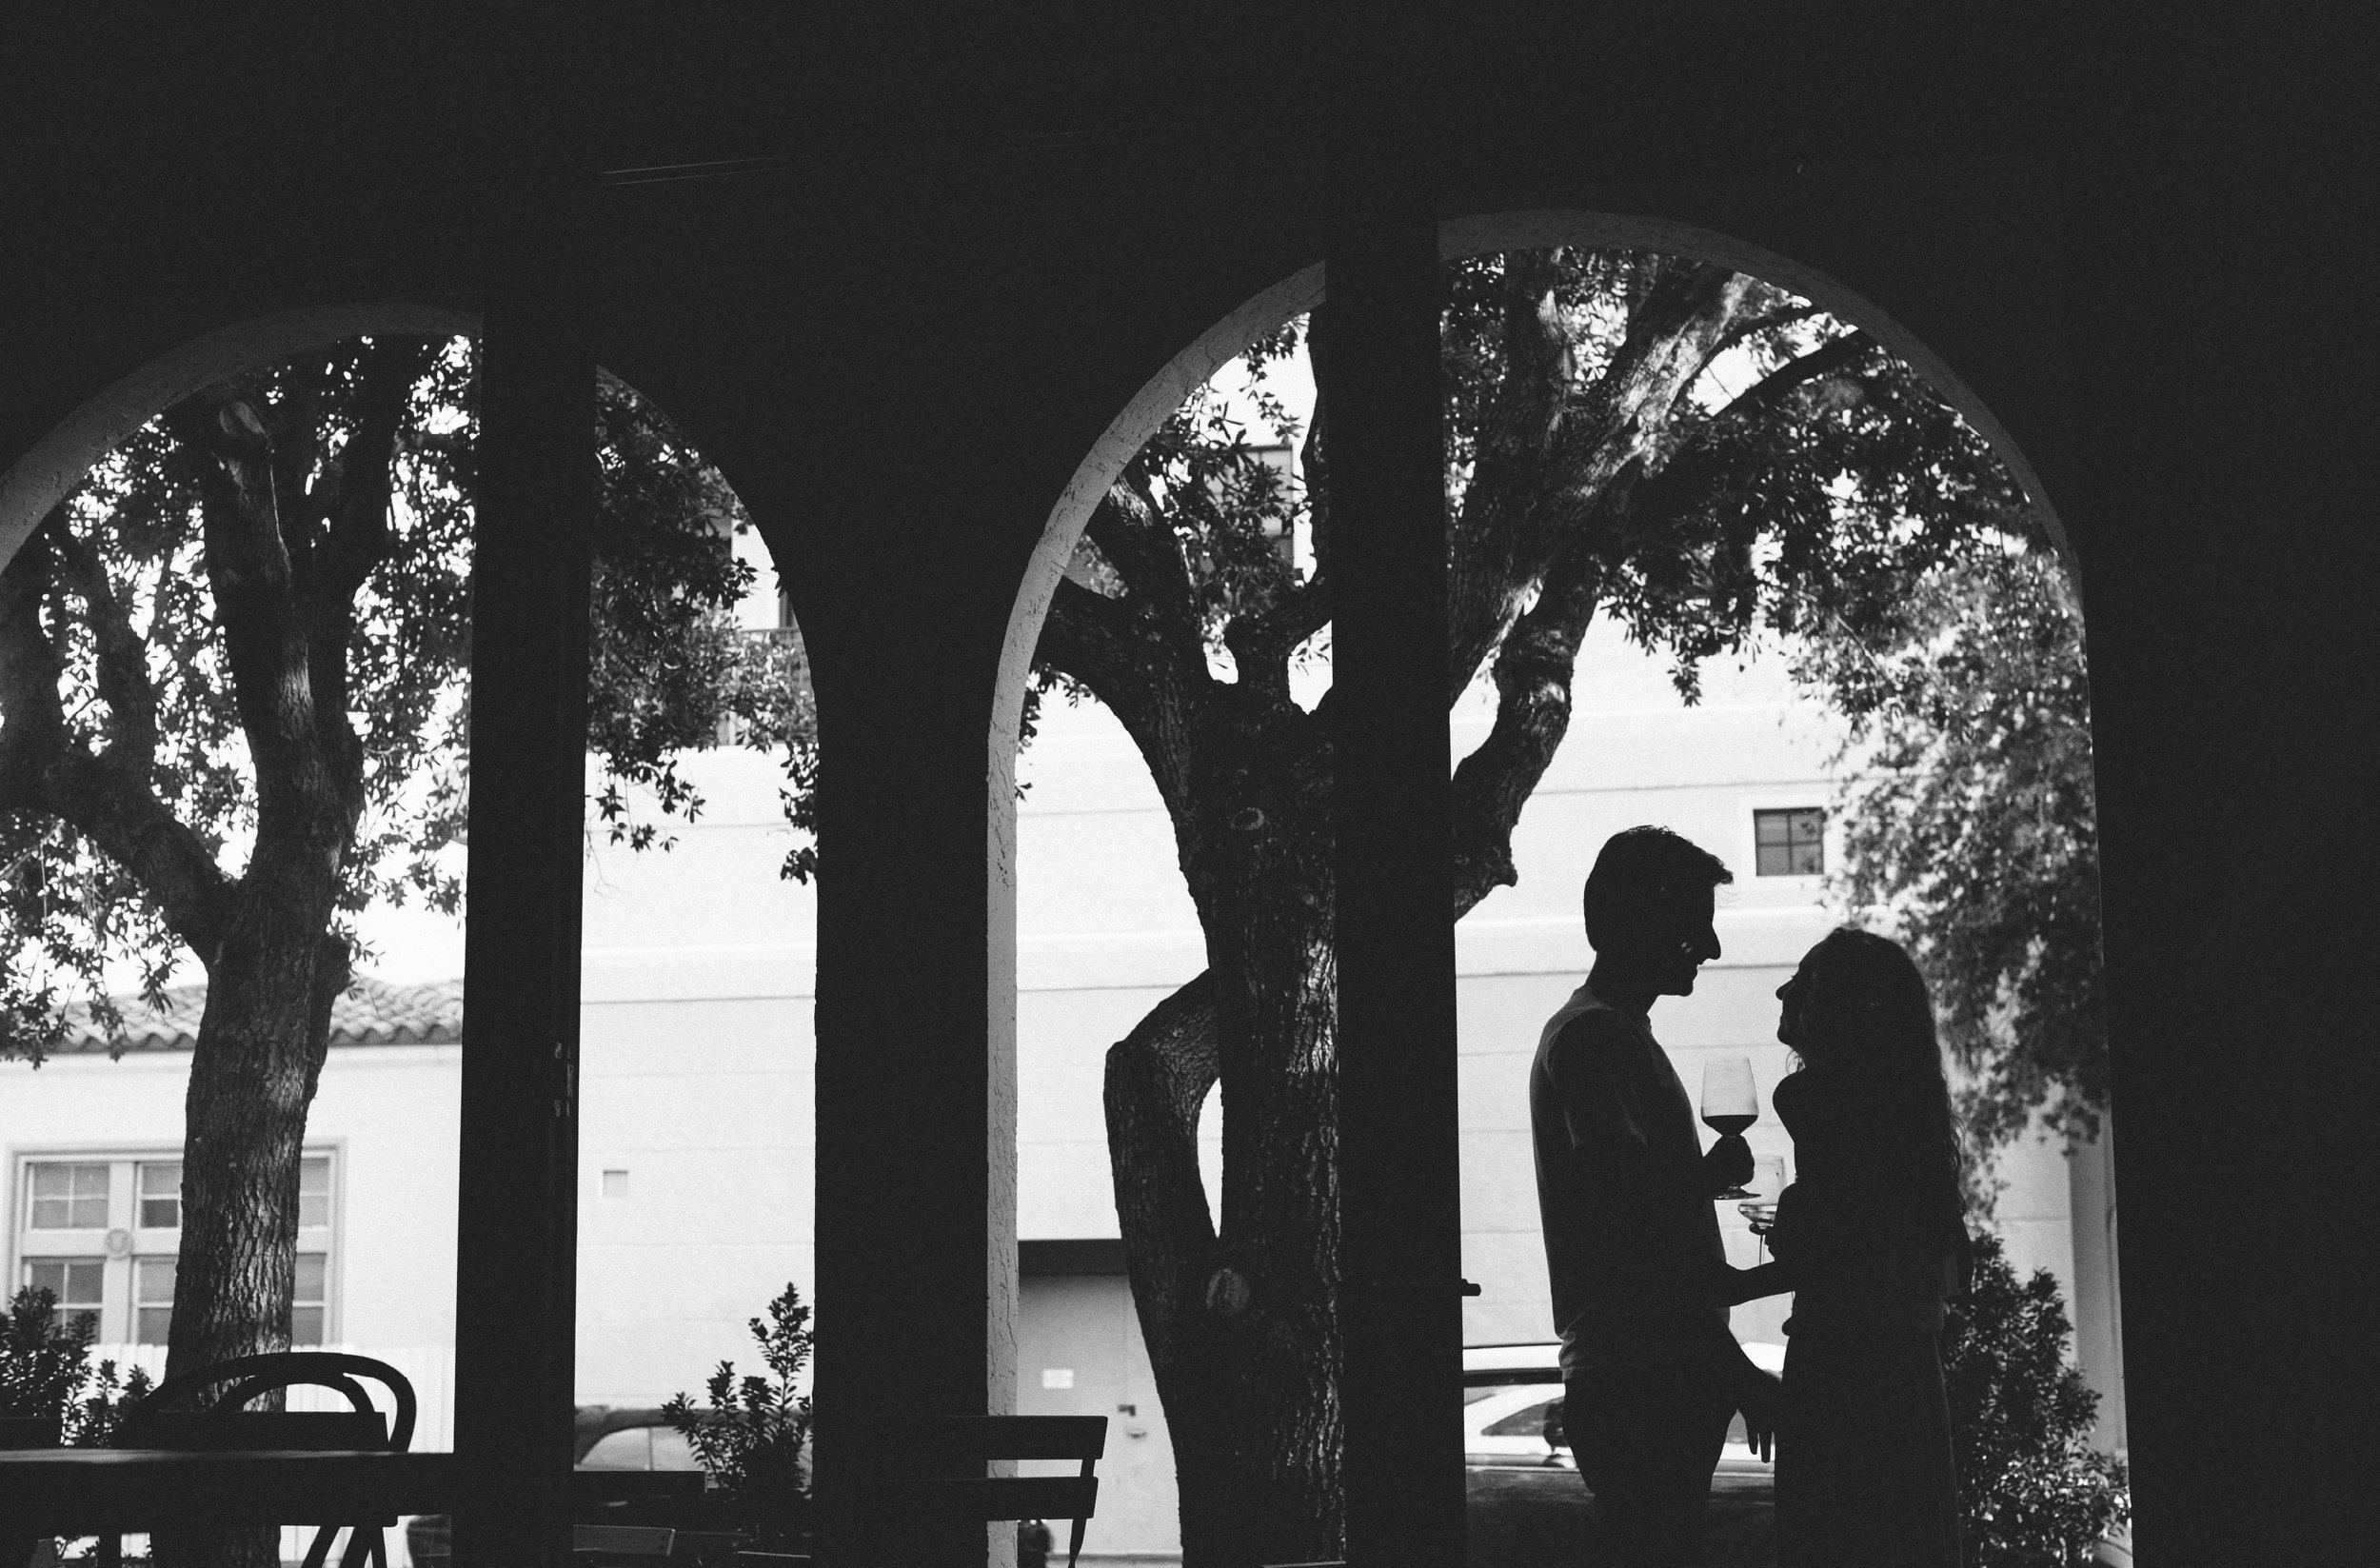 Briana + Bryan Social House Lake Worth Engagement16.jpg